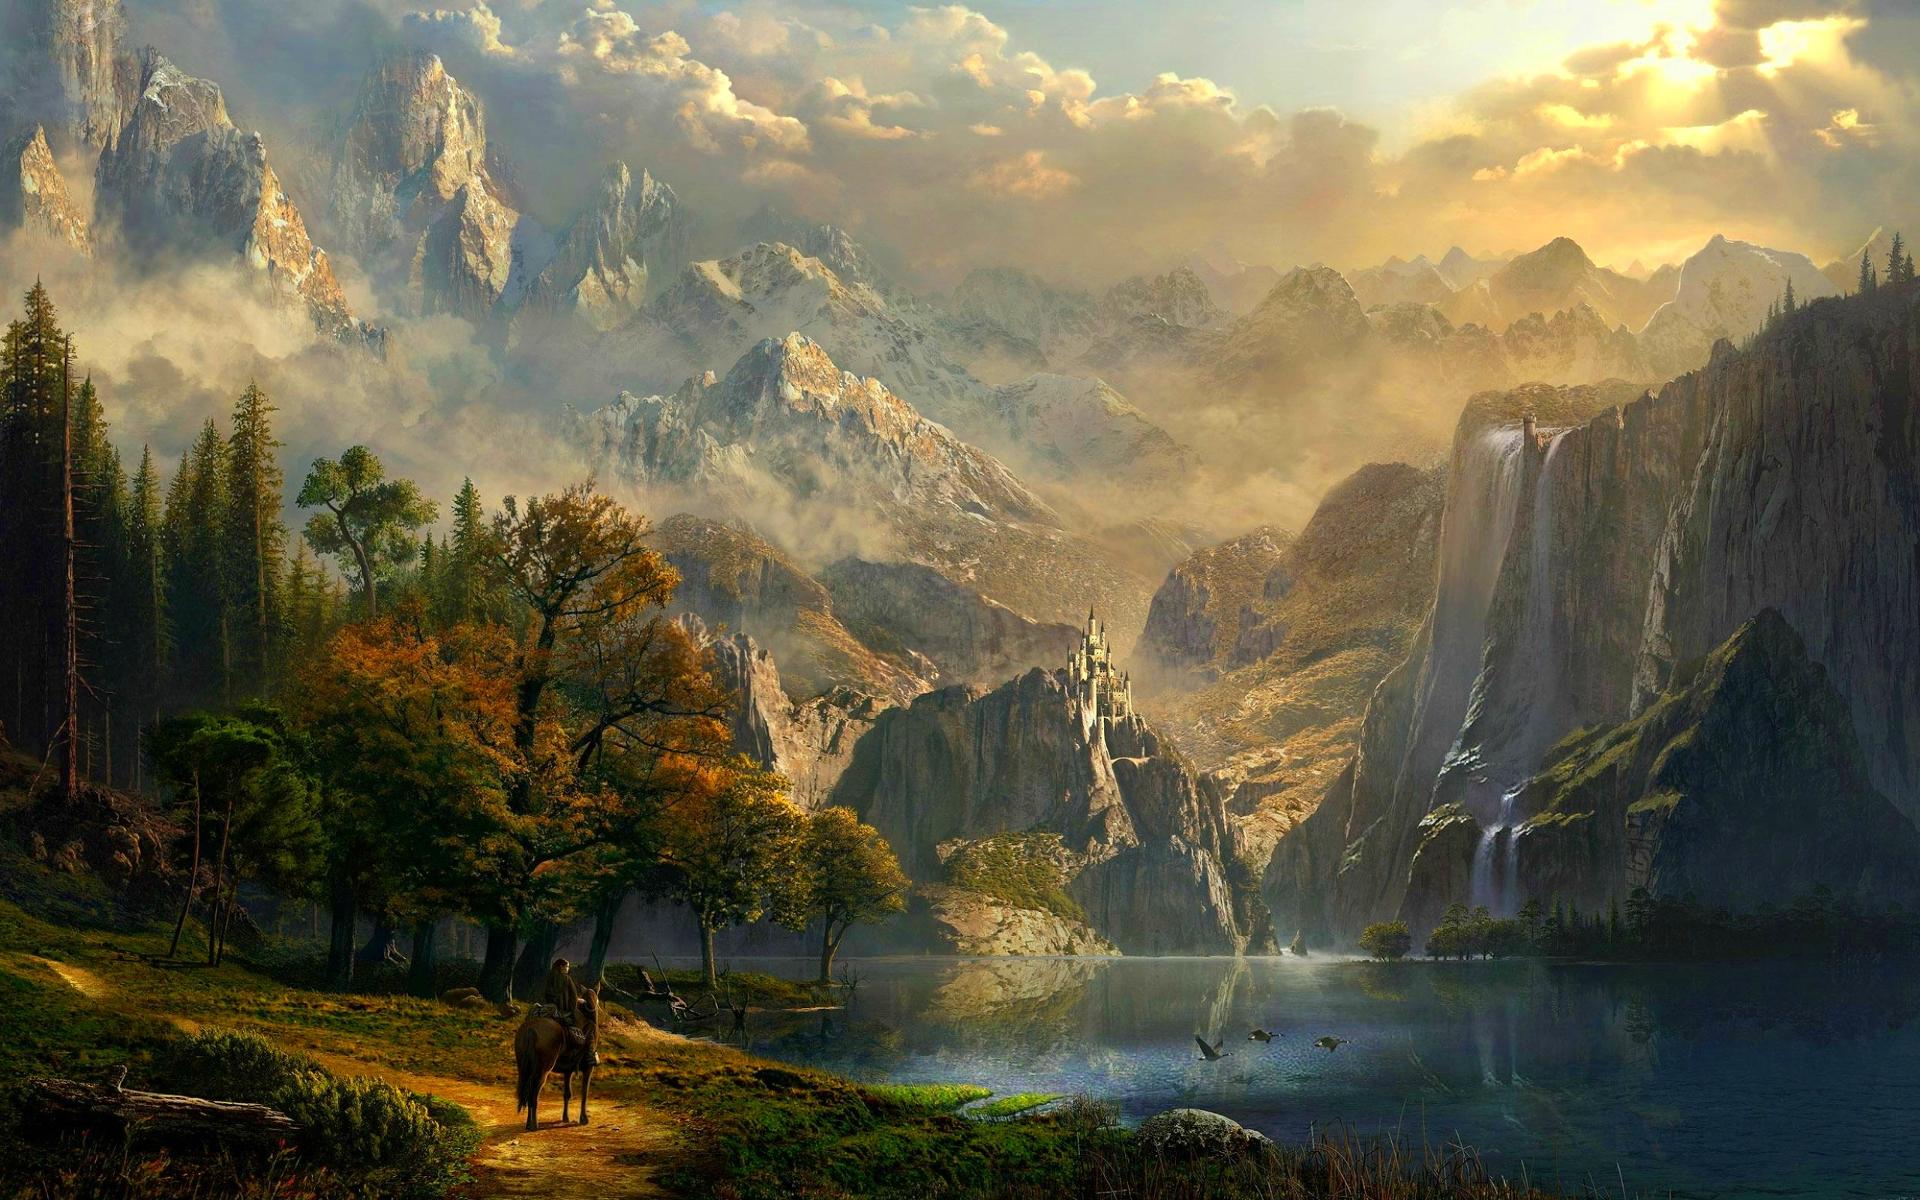 Landscape hd wallpaper background image 1920x1200 id - Fantasy desktop pictures ...